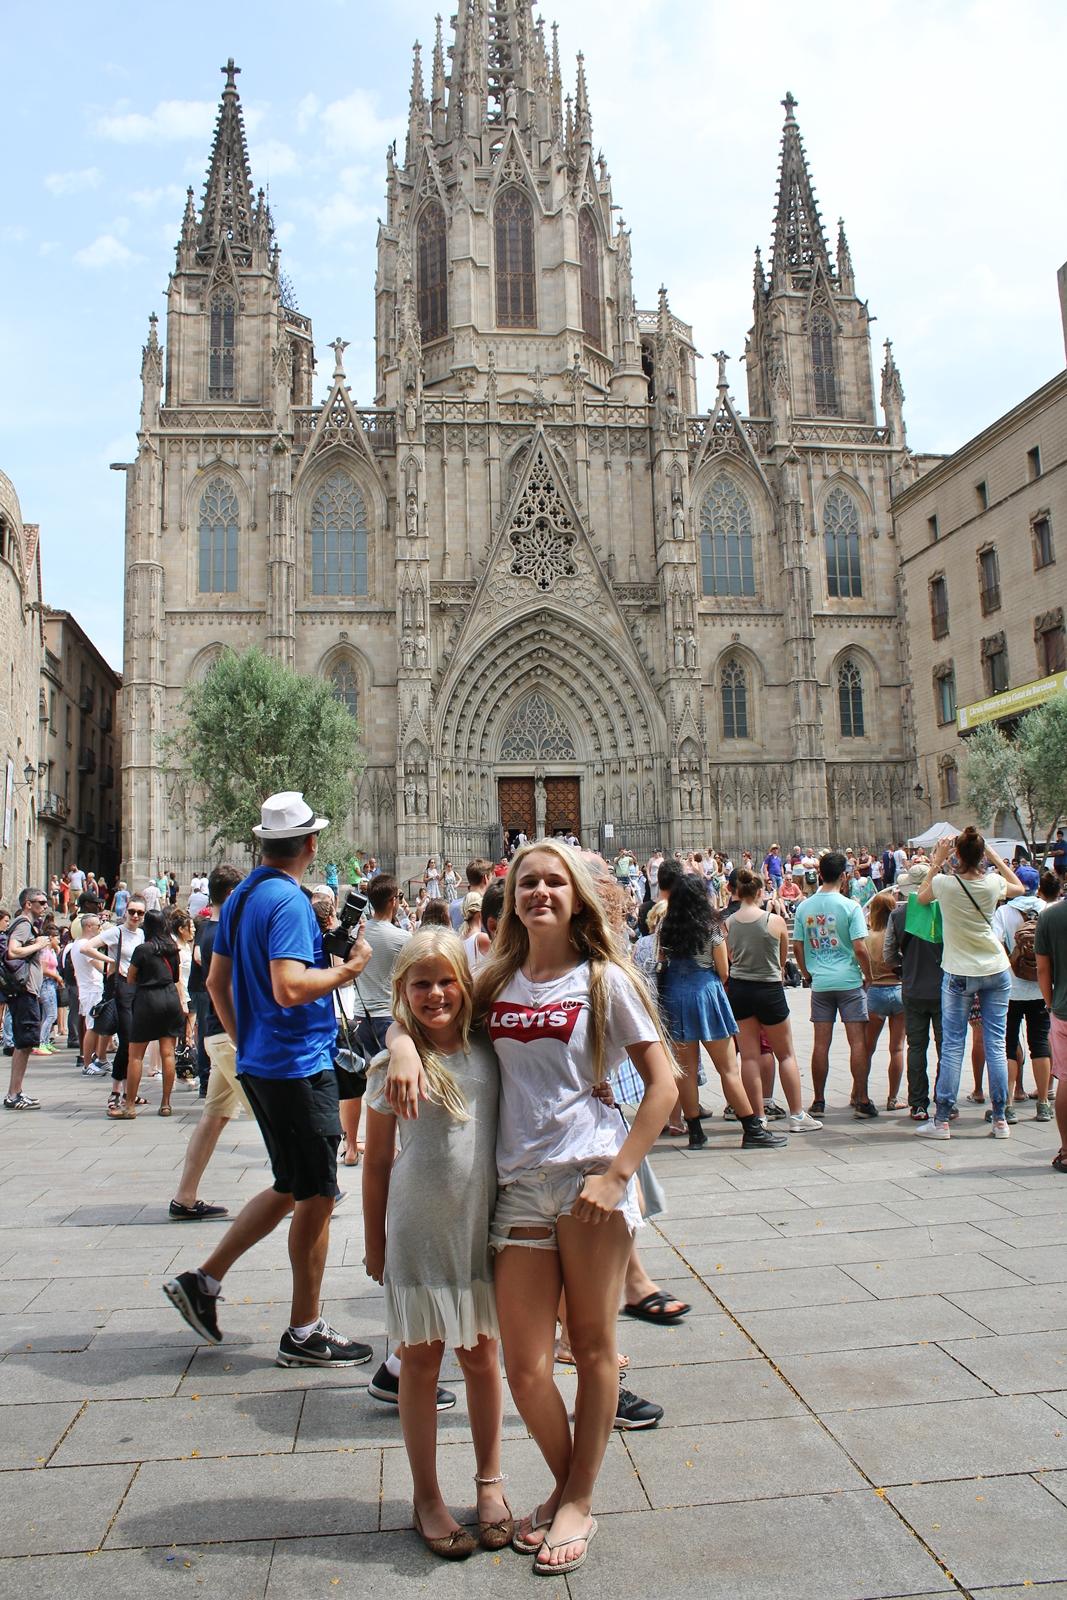 Resan fortsatte till Barcelona